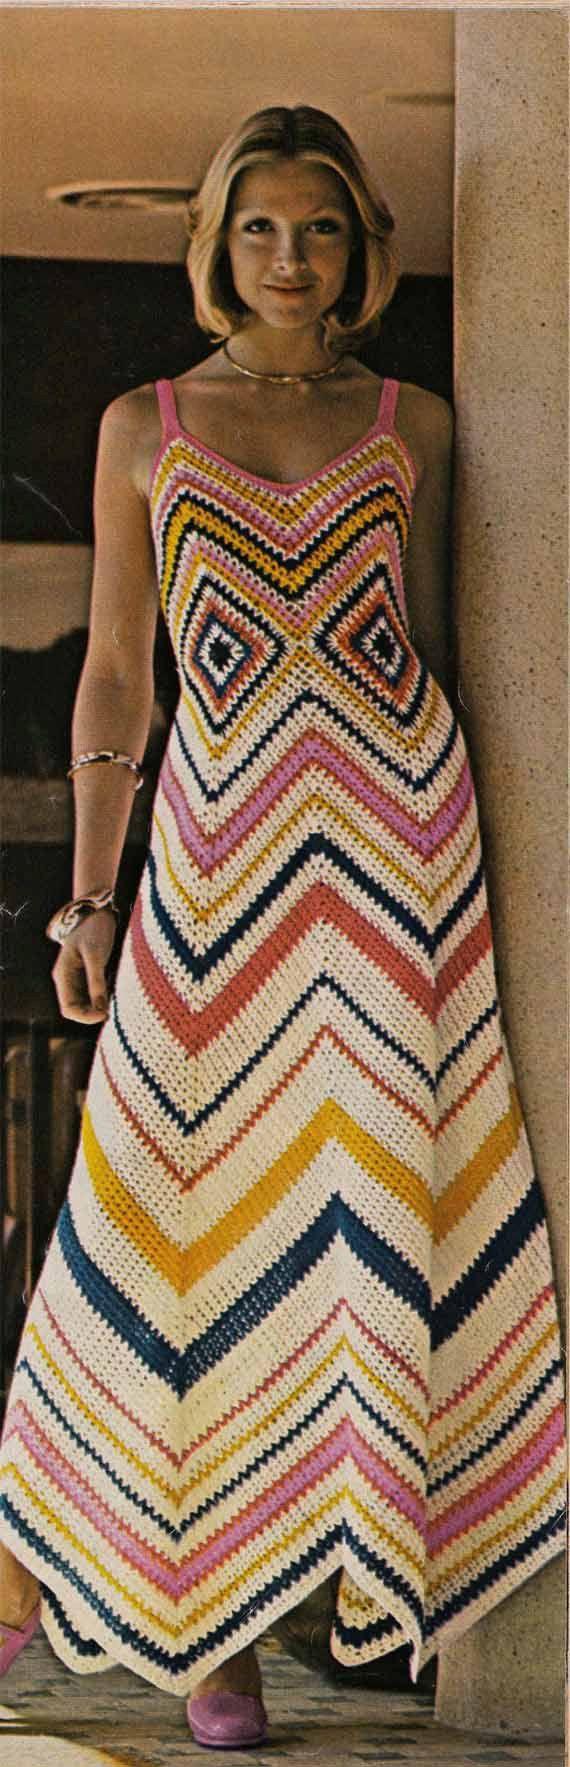 Crochet Dress Pattern Pdf Vintage 1960s Boho GRANNY SQUARE DRESS pattern Treasury Item from GrannyTakesATrip 0143. $3.00, via Etsy.